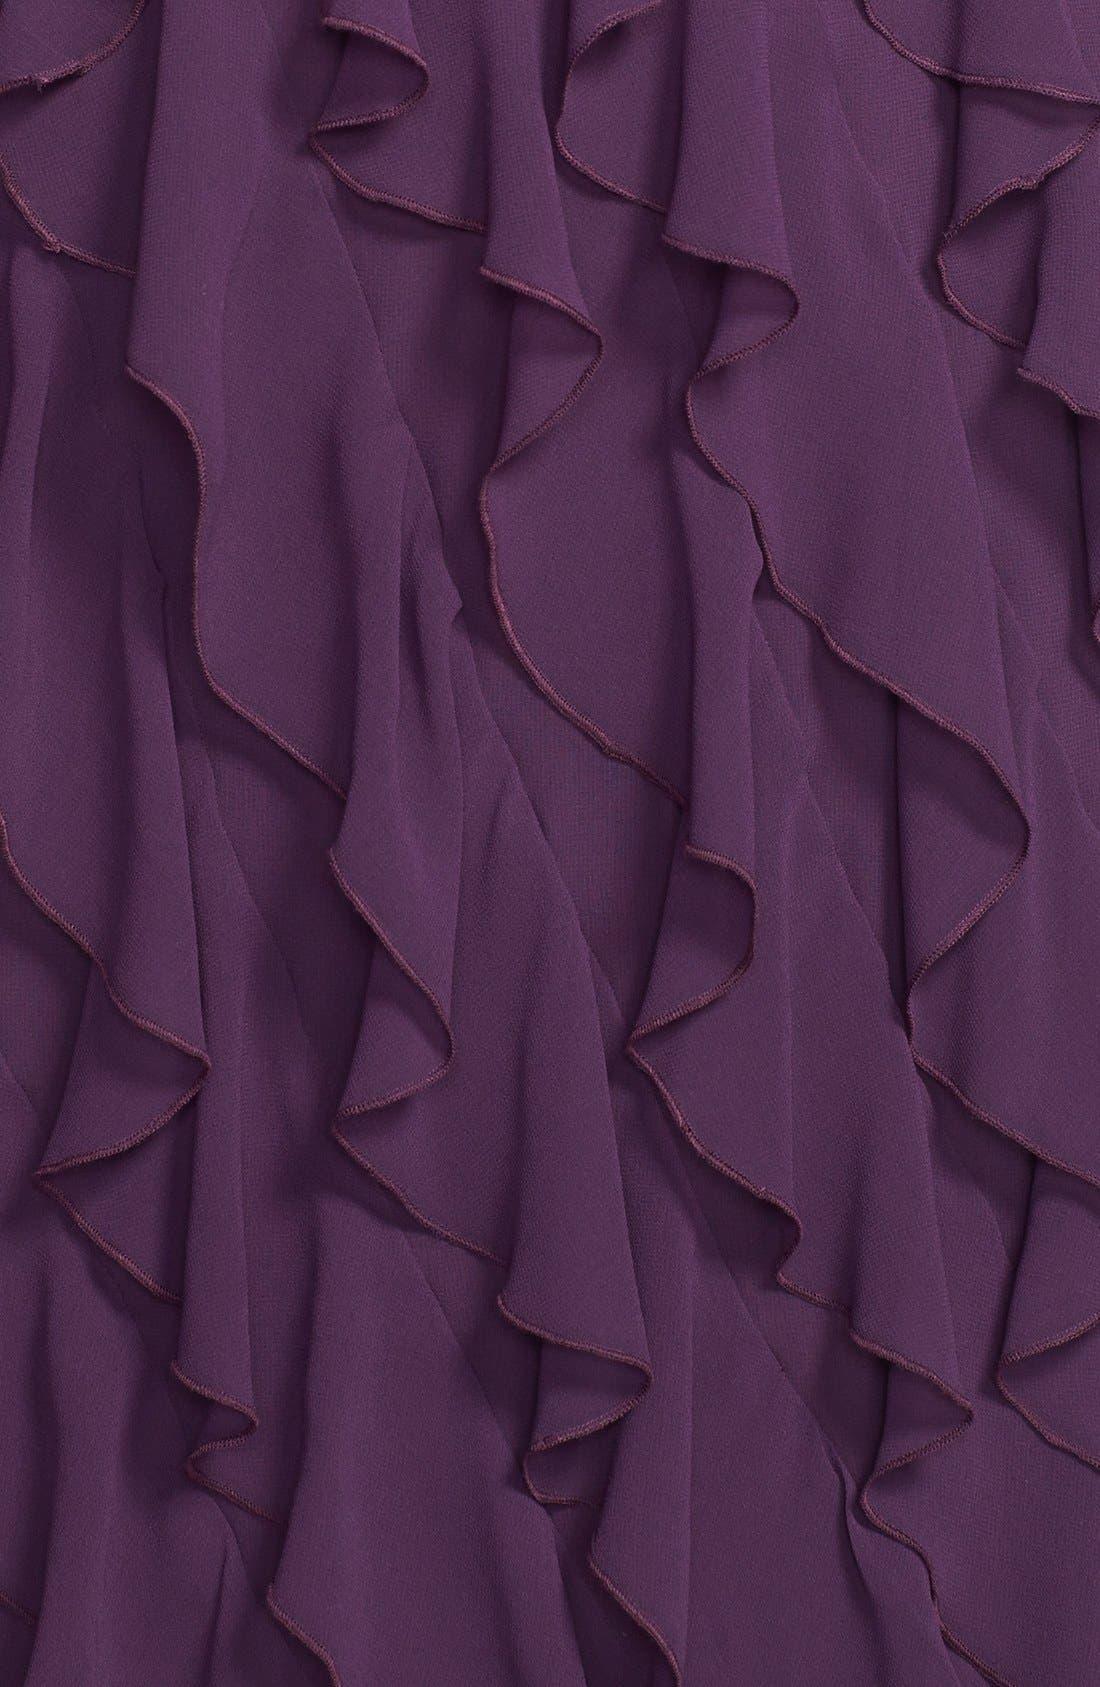 Alternate Image 3  - Ivy & Blu V-Neck Ruffled Skirt Chiffon Dress (Plus Size)